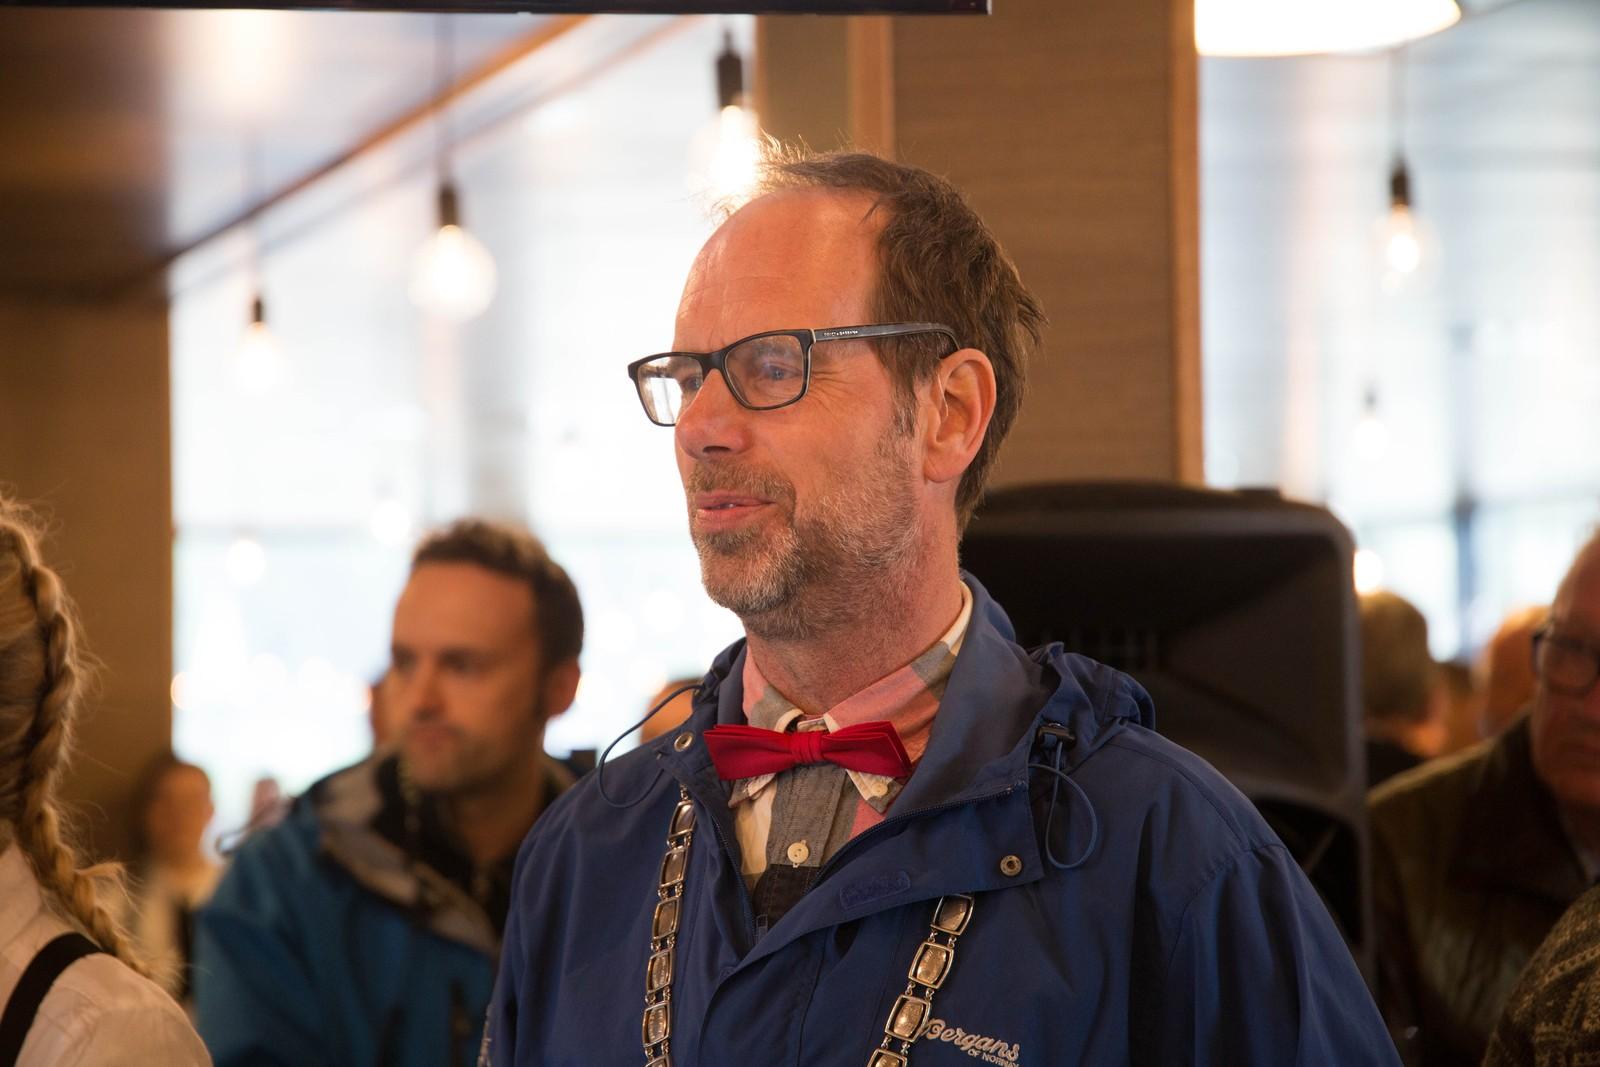 Ordfører Lars Olav Hustad var strålende fornøyd med dagen.